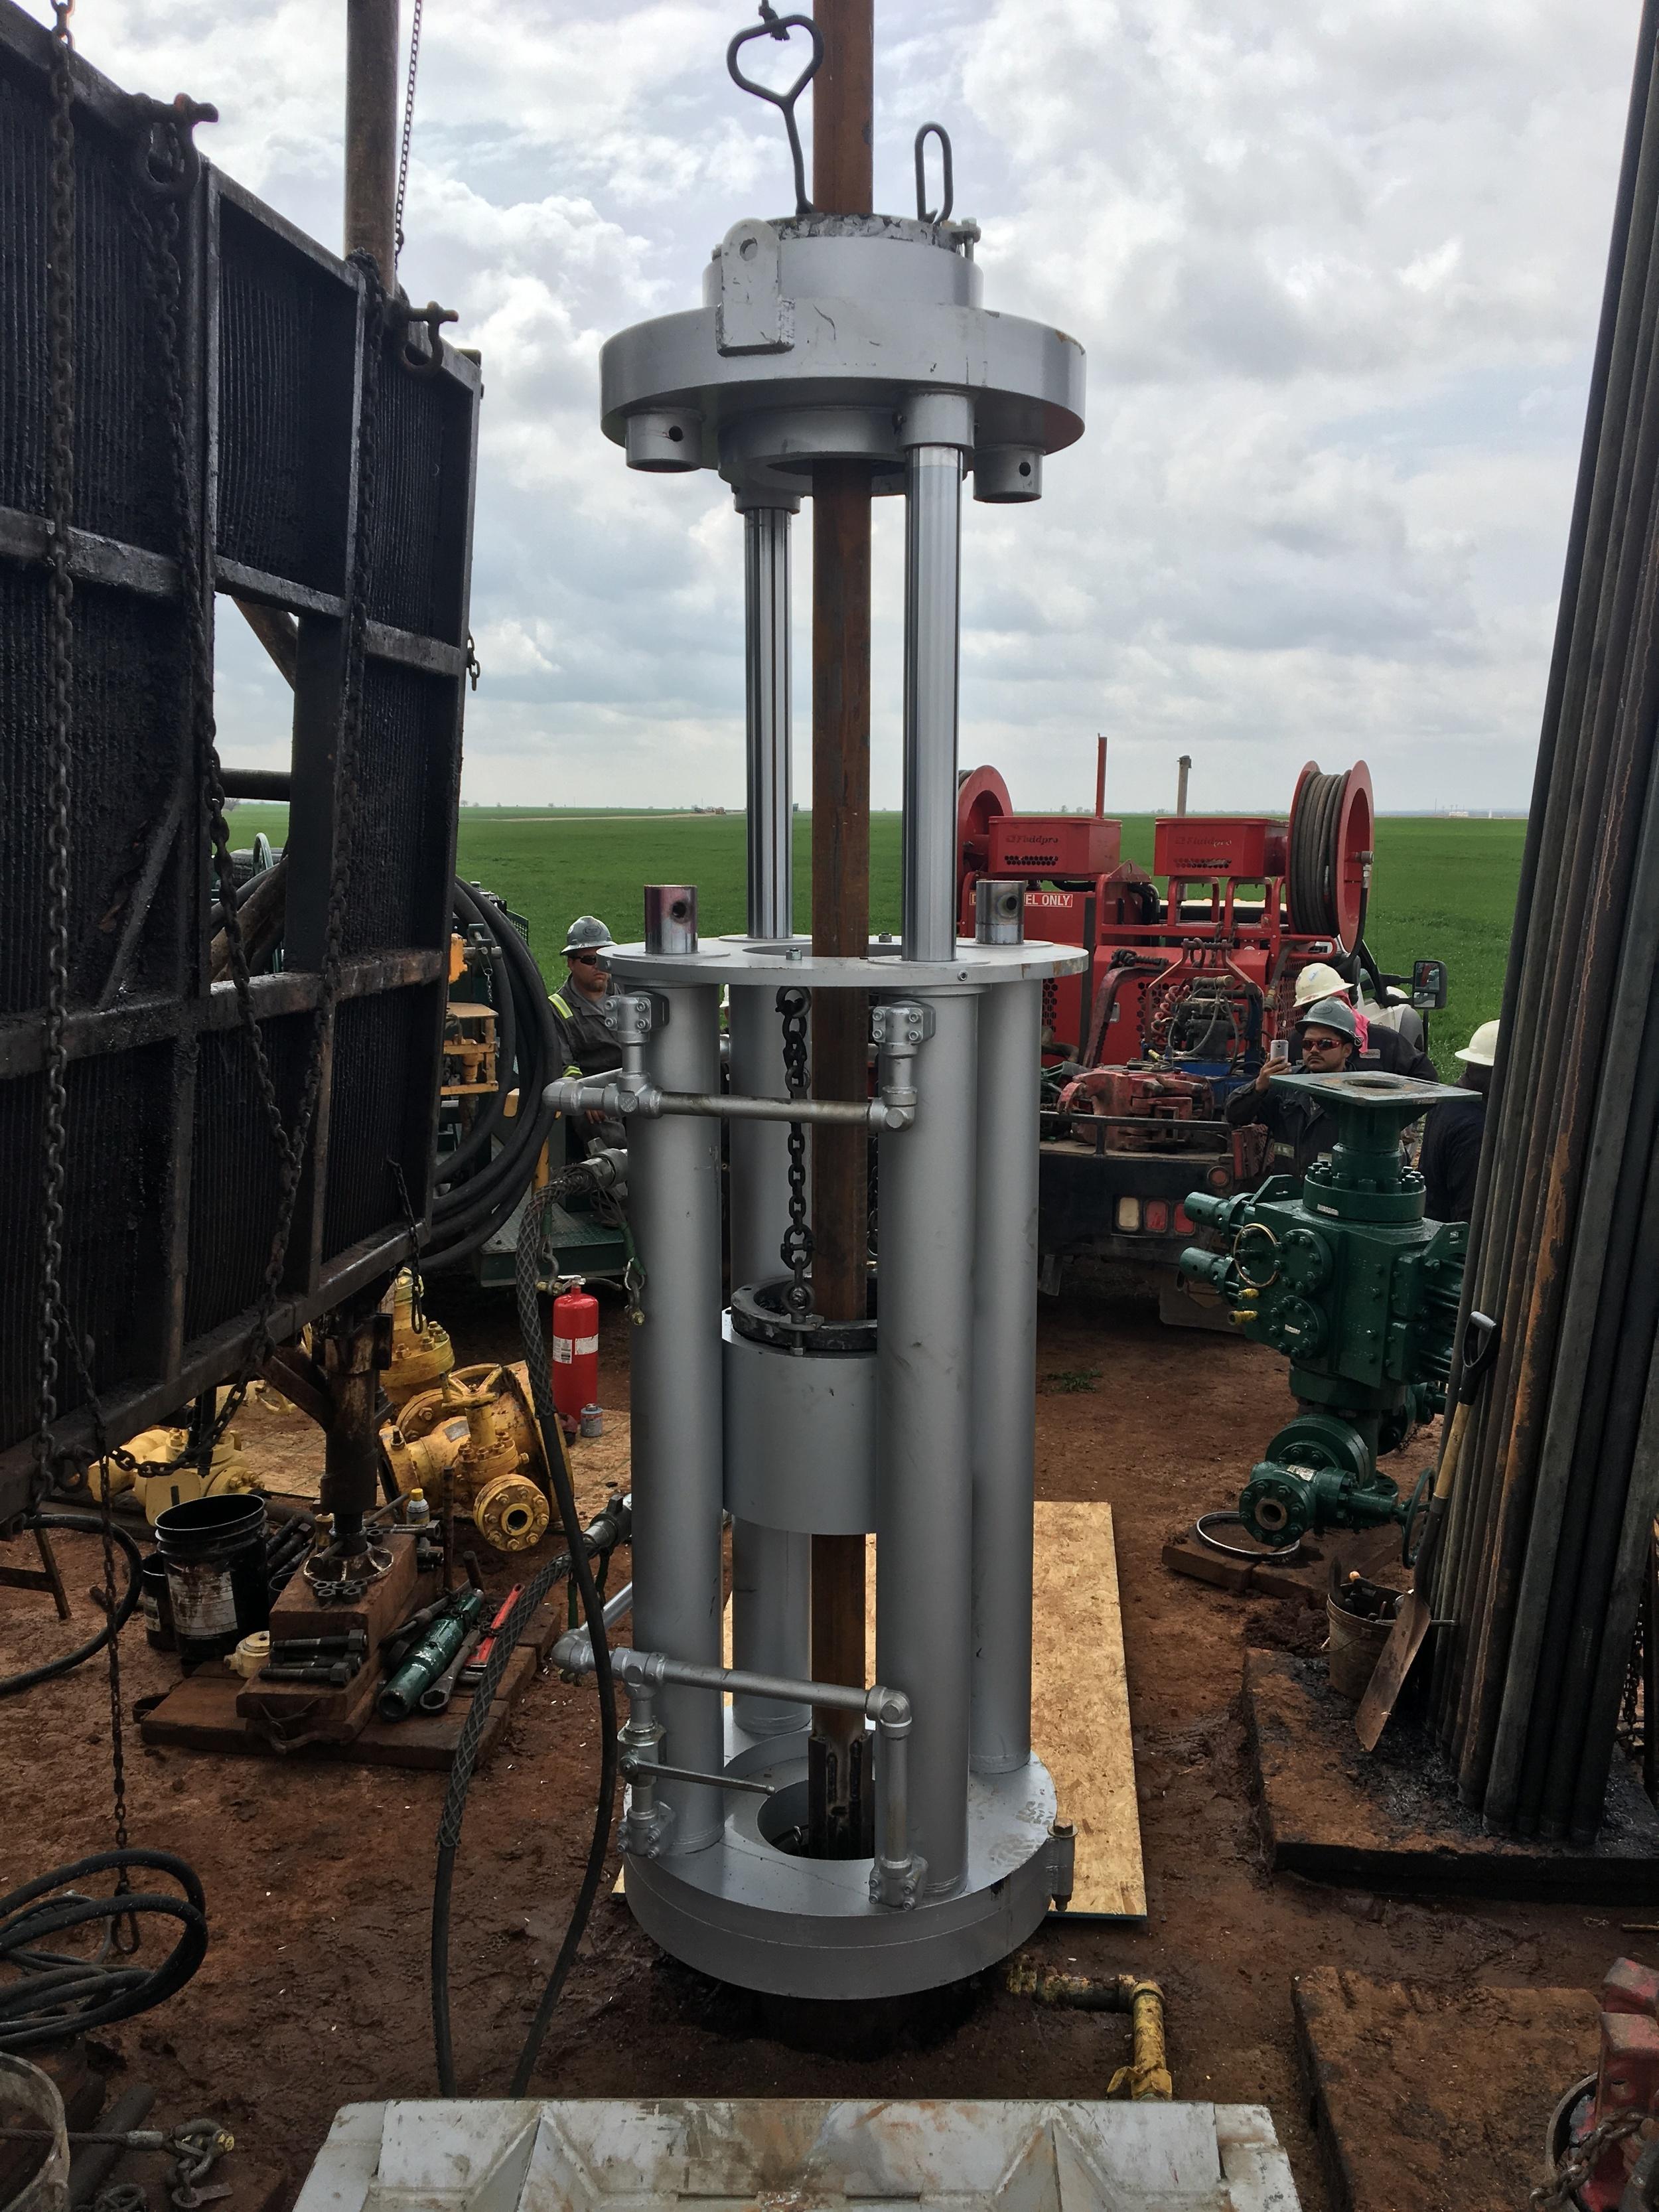 Model 282 casing jack - two cylinder operation